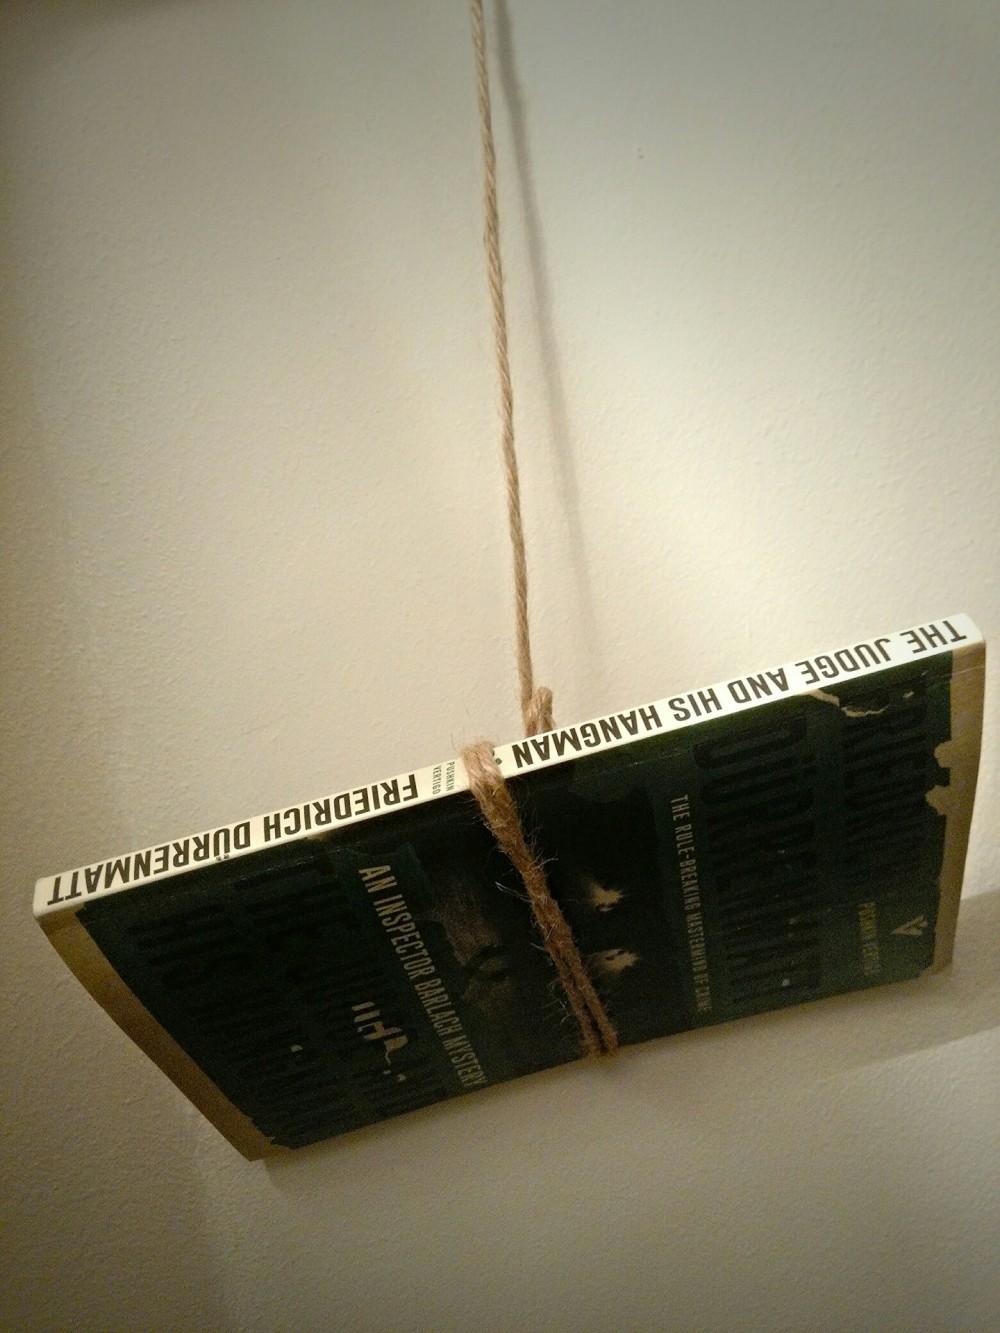 Judge and His Hangman - Friedrich Durrenmatt - book review - Hits the Fan 3